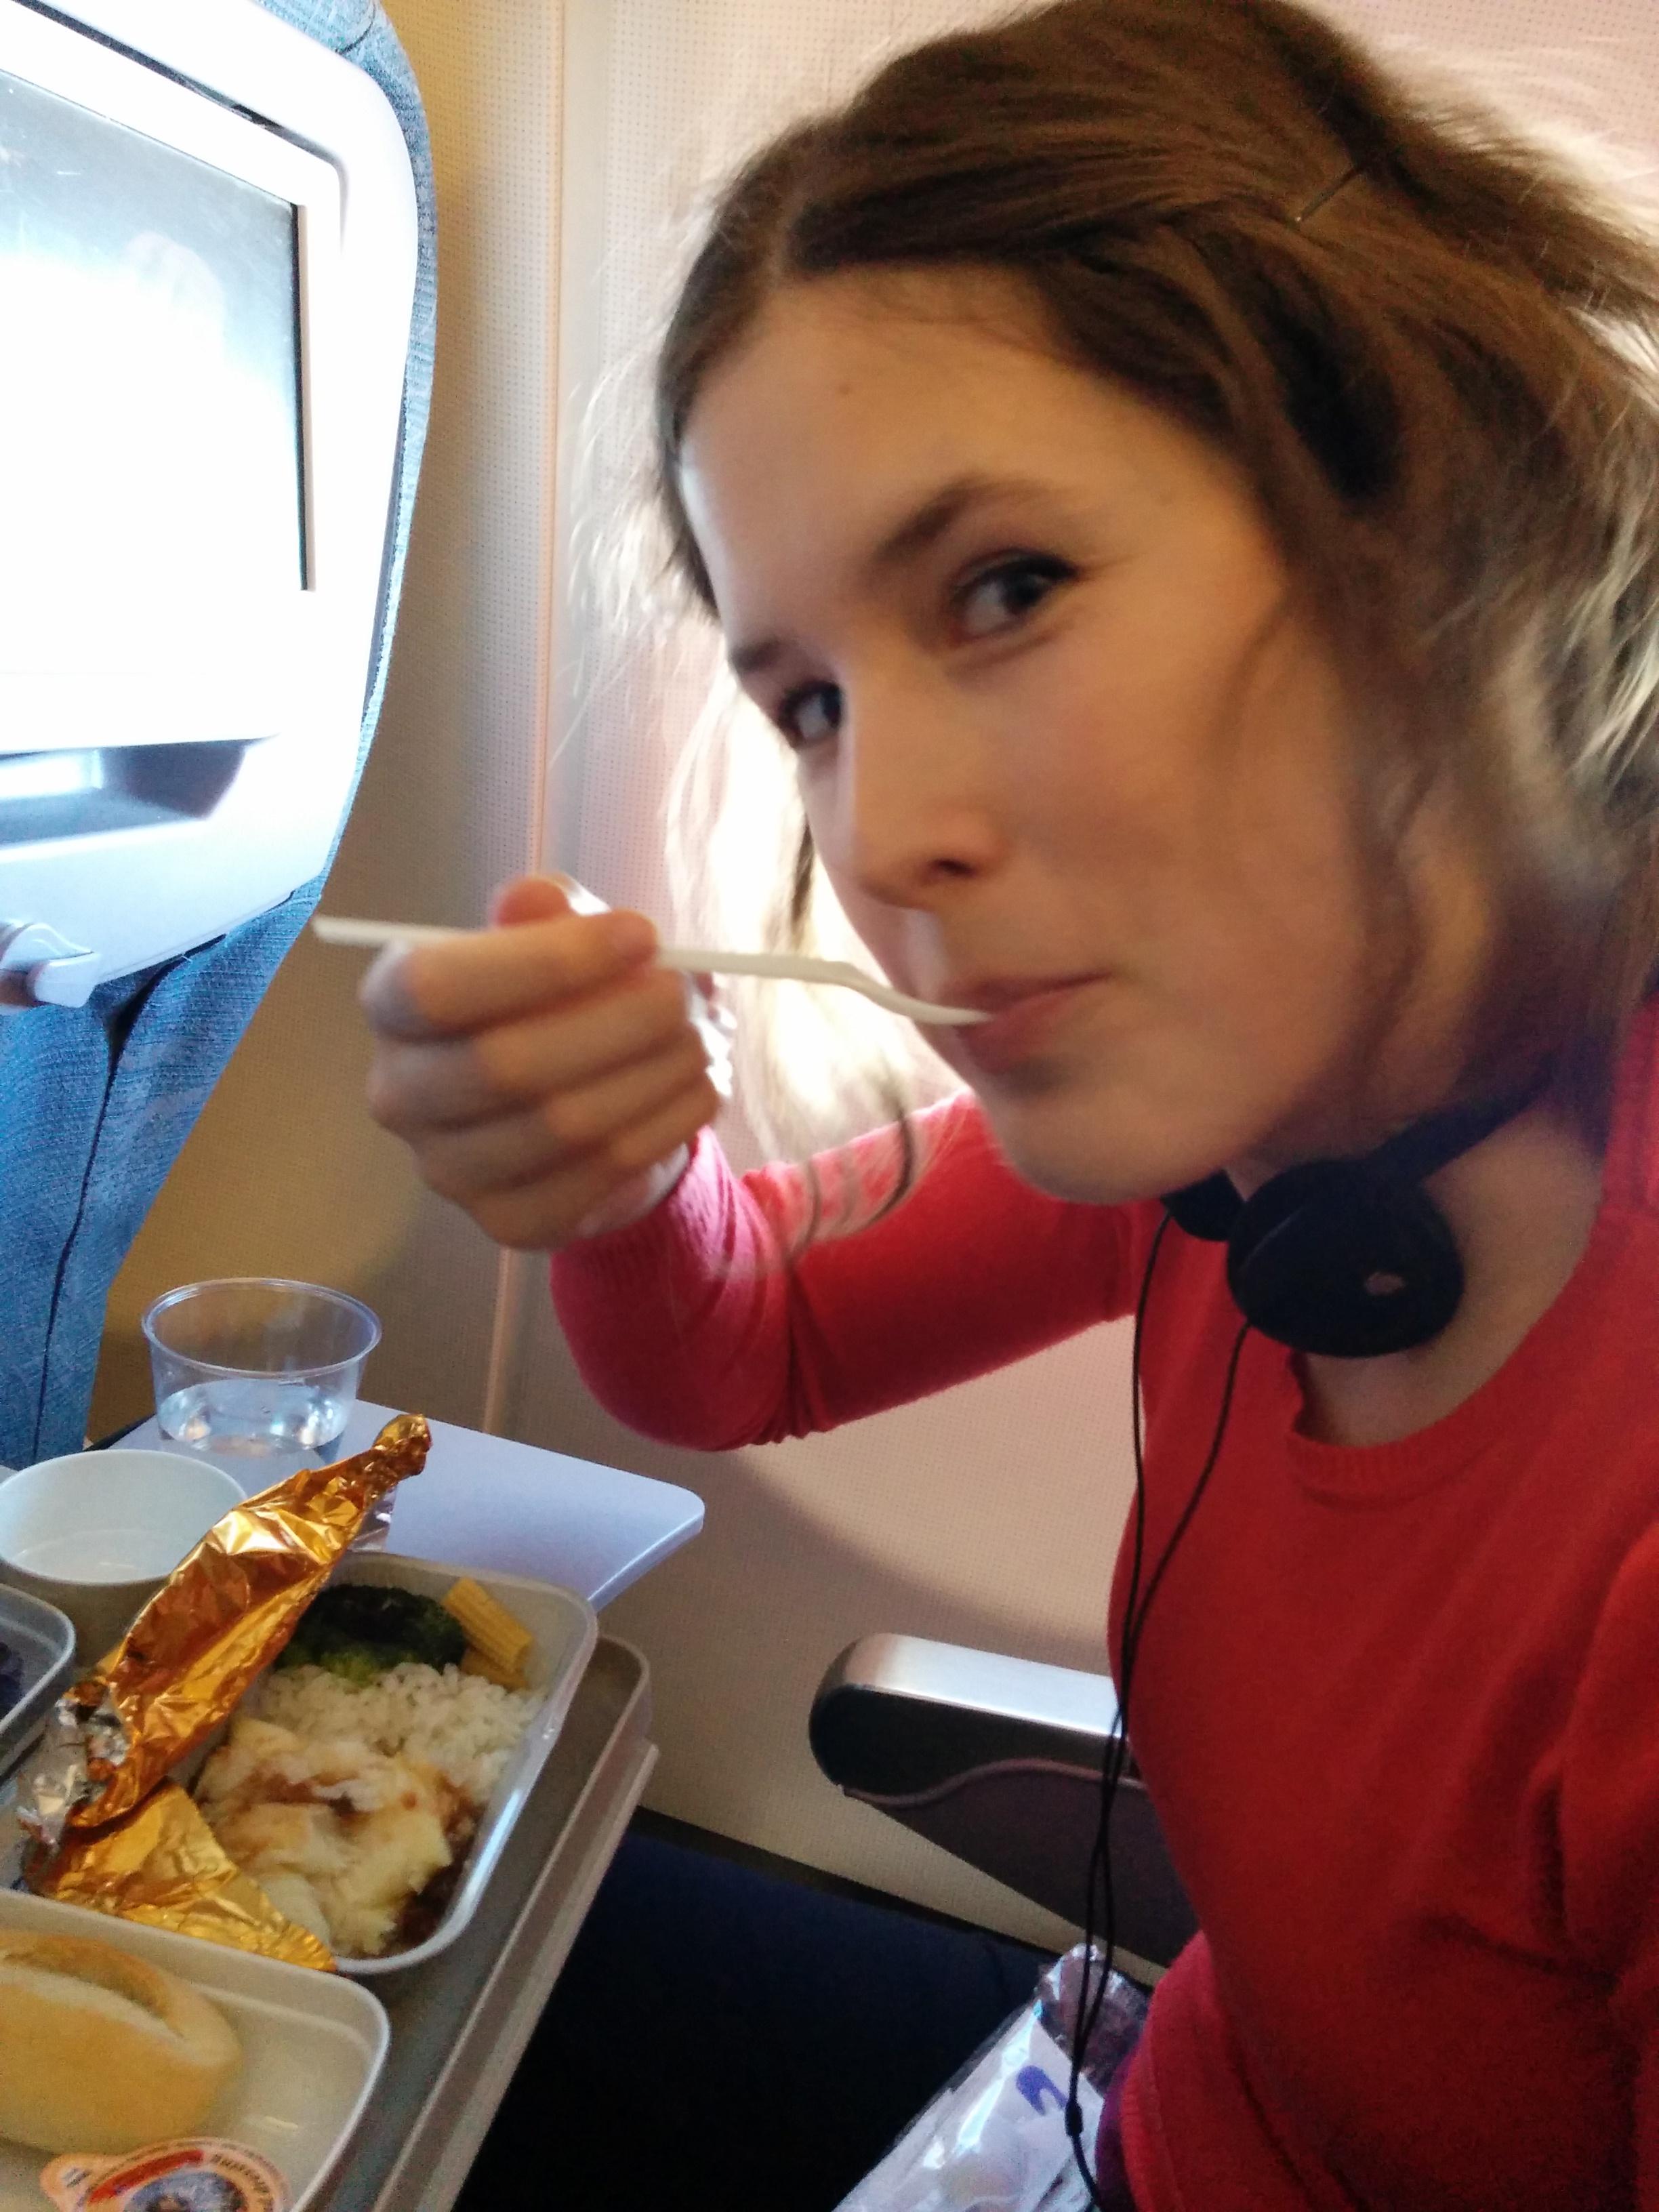 Veronika eating airplane food.